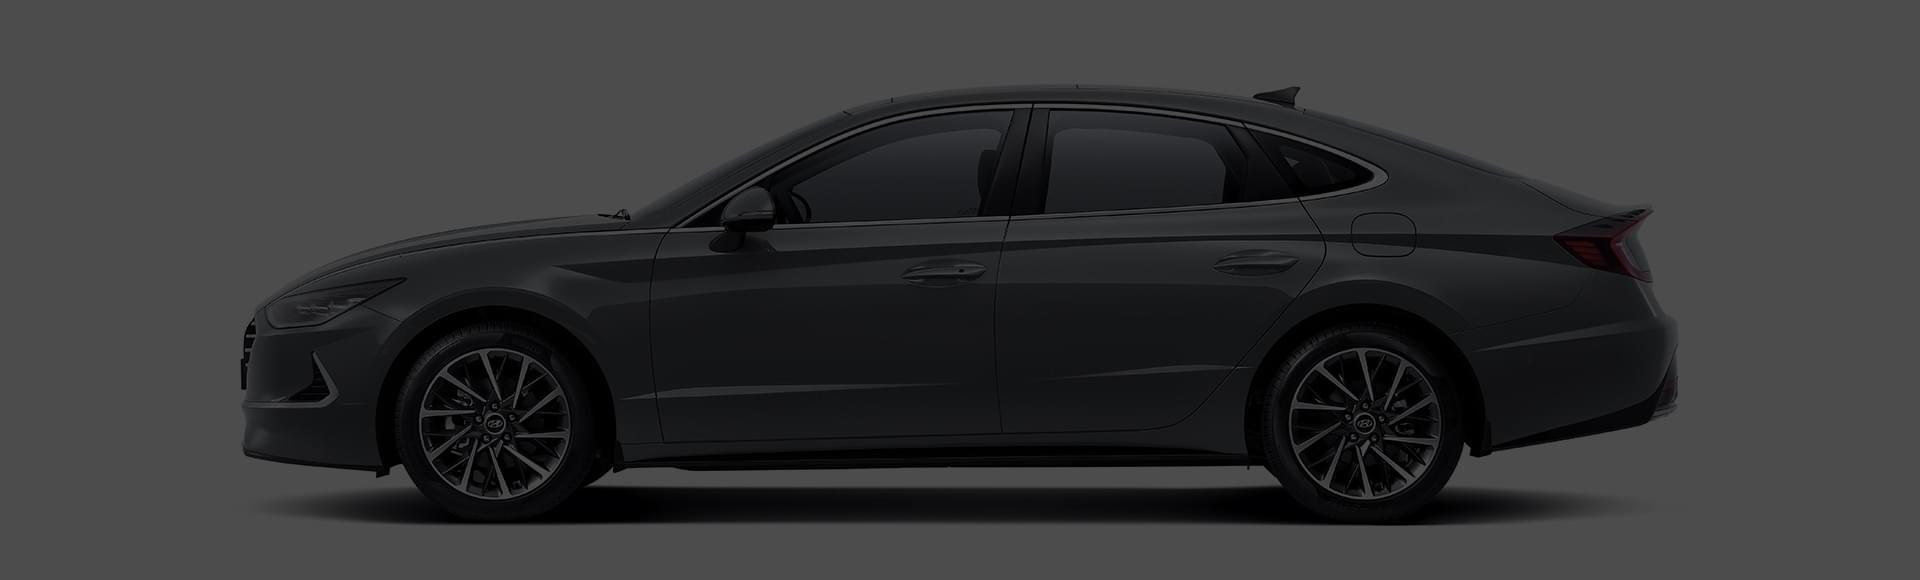 Sonata exterior side design